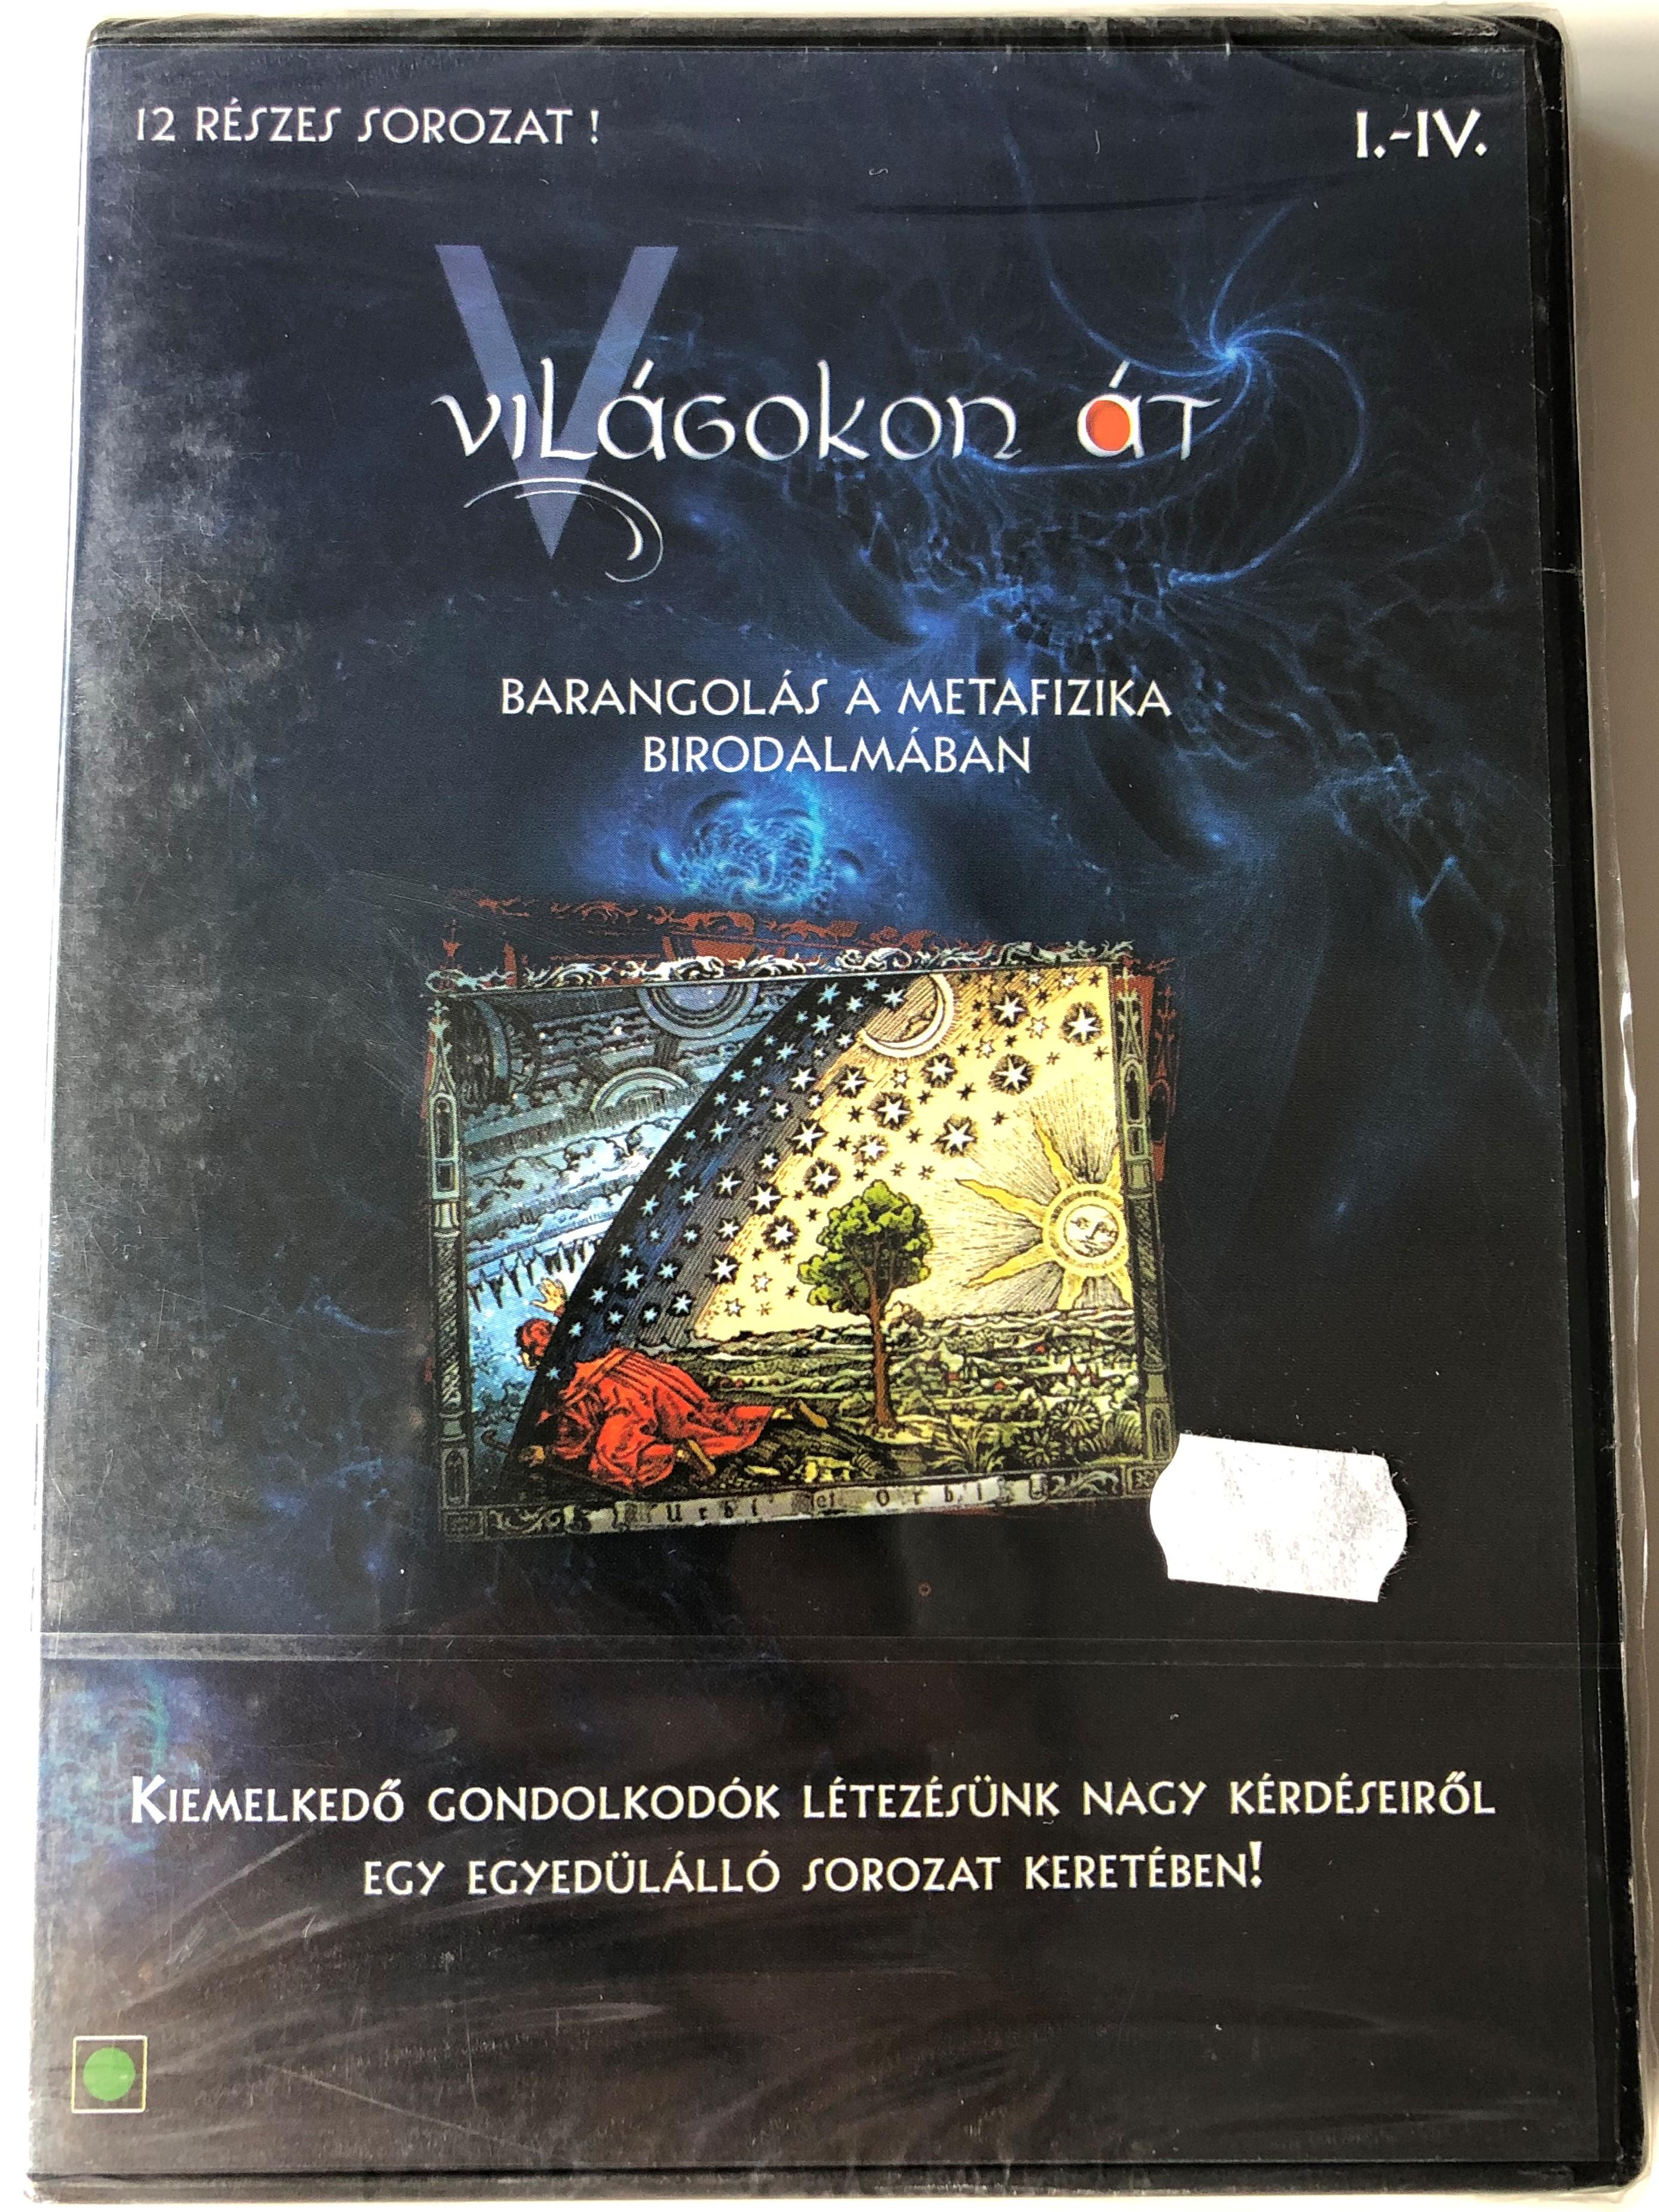 vil-gokon-t-dvd-1999-across-worlds-1.jpg